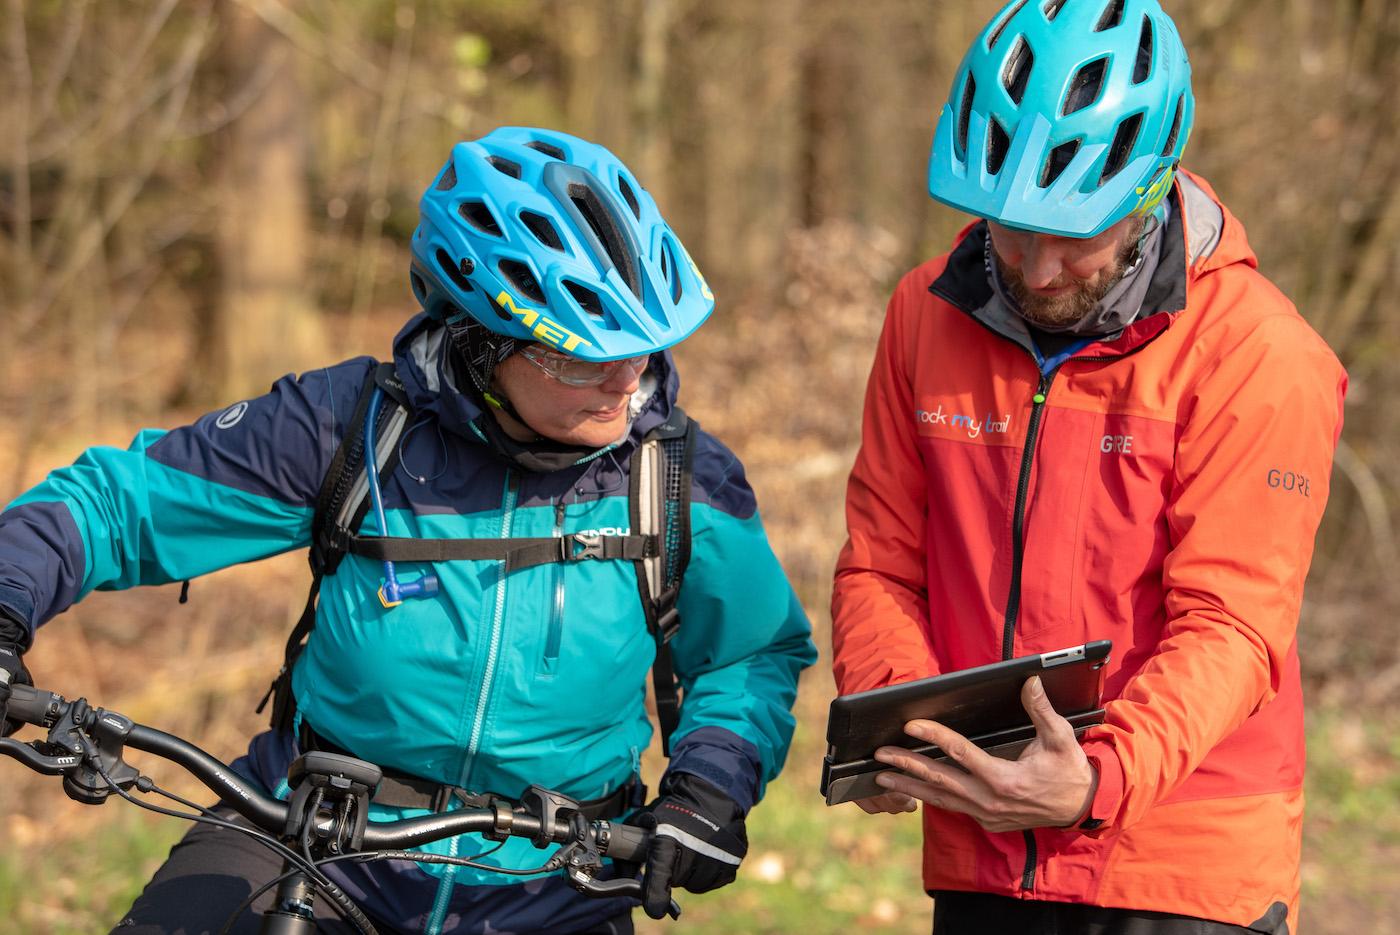 eMTB eBike Fortgeschritten Fahrtechnik Kurs in Siegen - Rock my Trail Bikeschule39